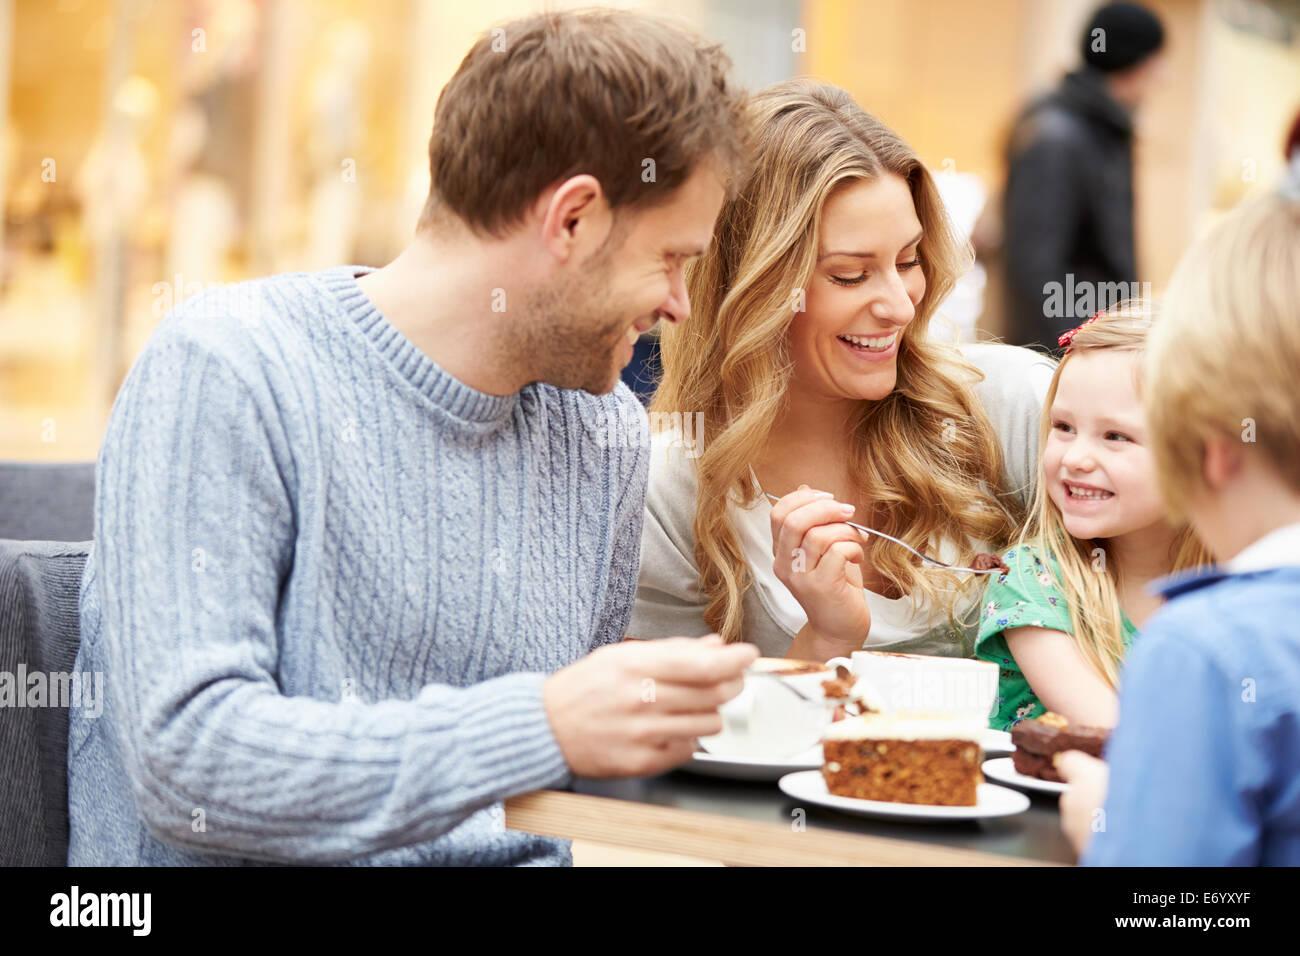 Familie Snack im Café gemeinsam genießen Stockbild